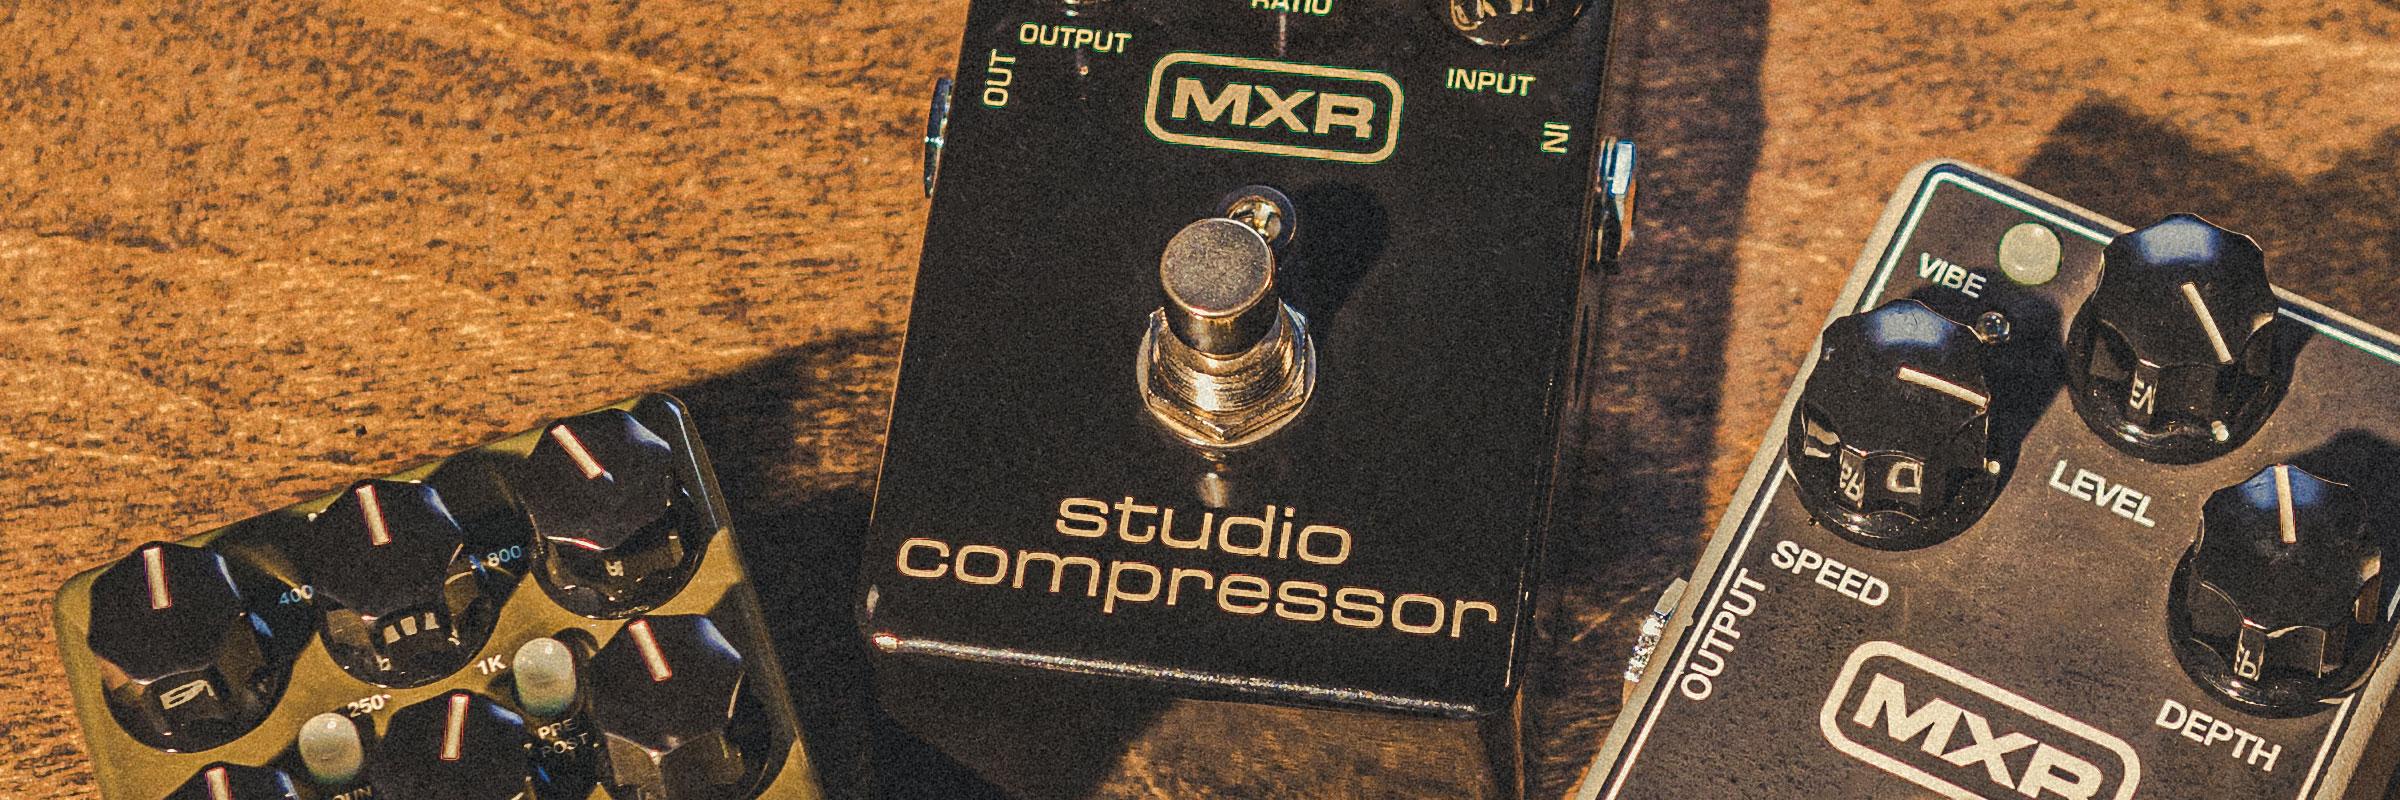 MXR<sup>®</sup> STUDIO COMPRESSOR